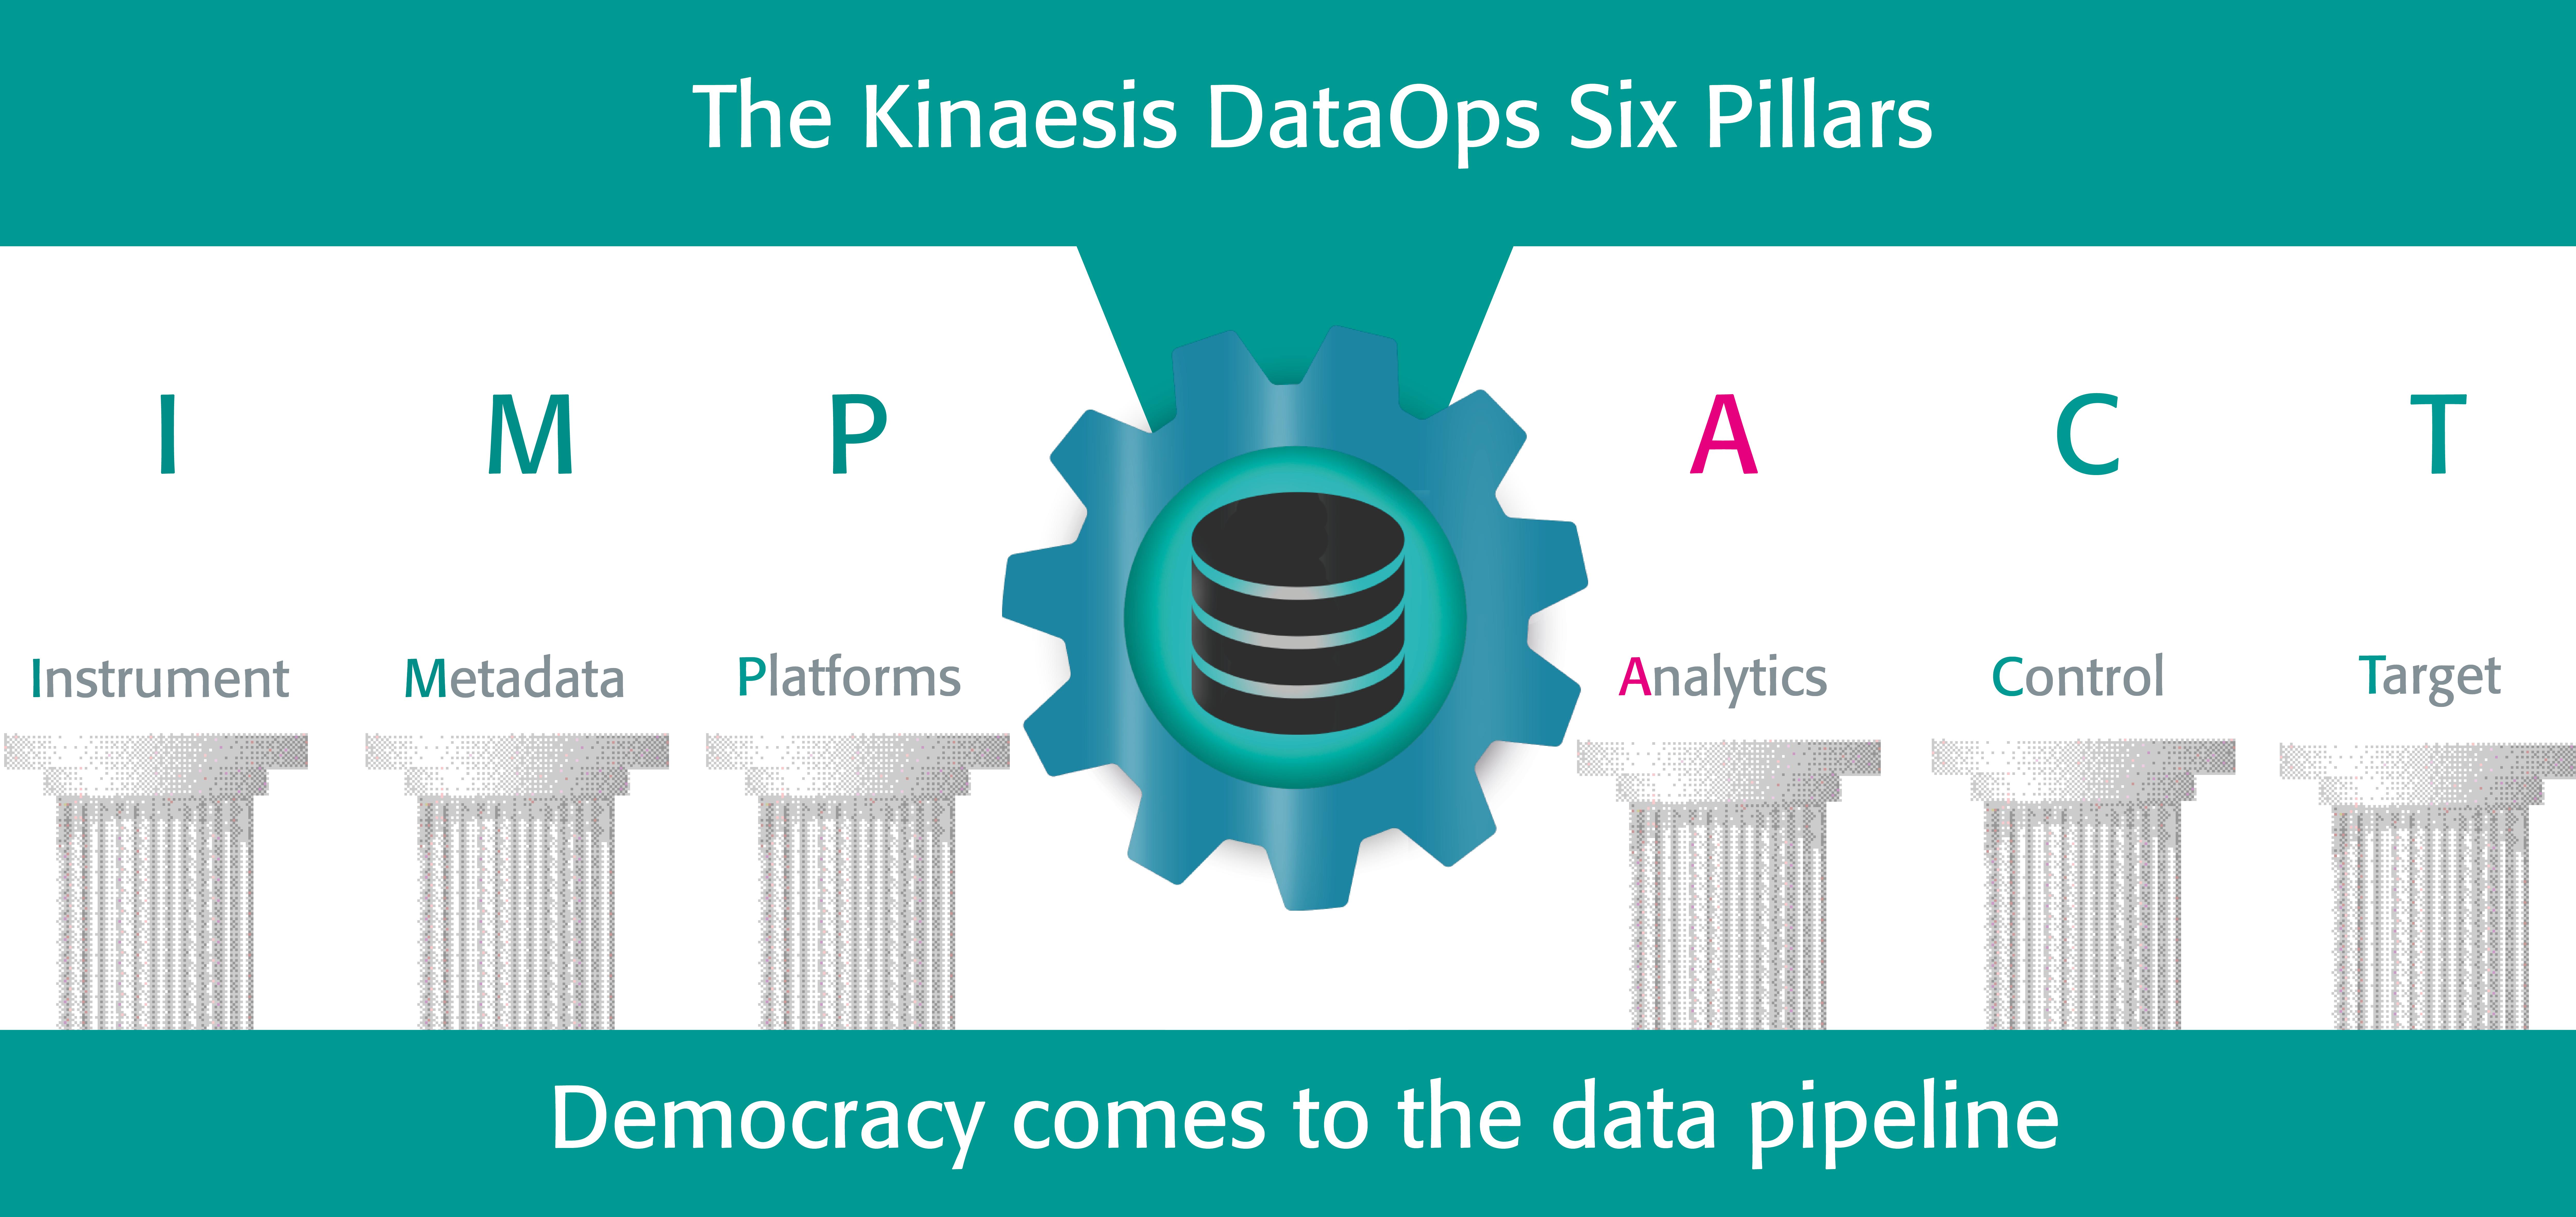 DataOps Pillar: Instrument